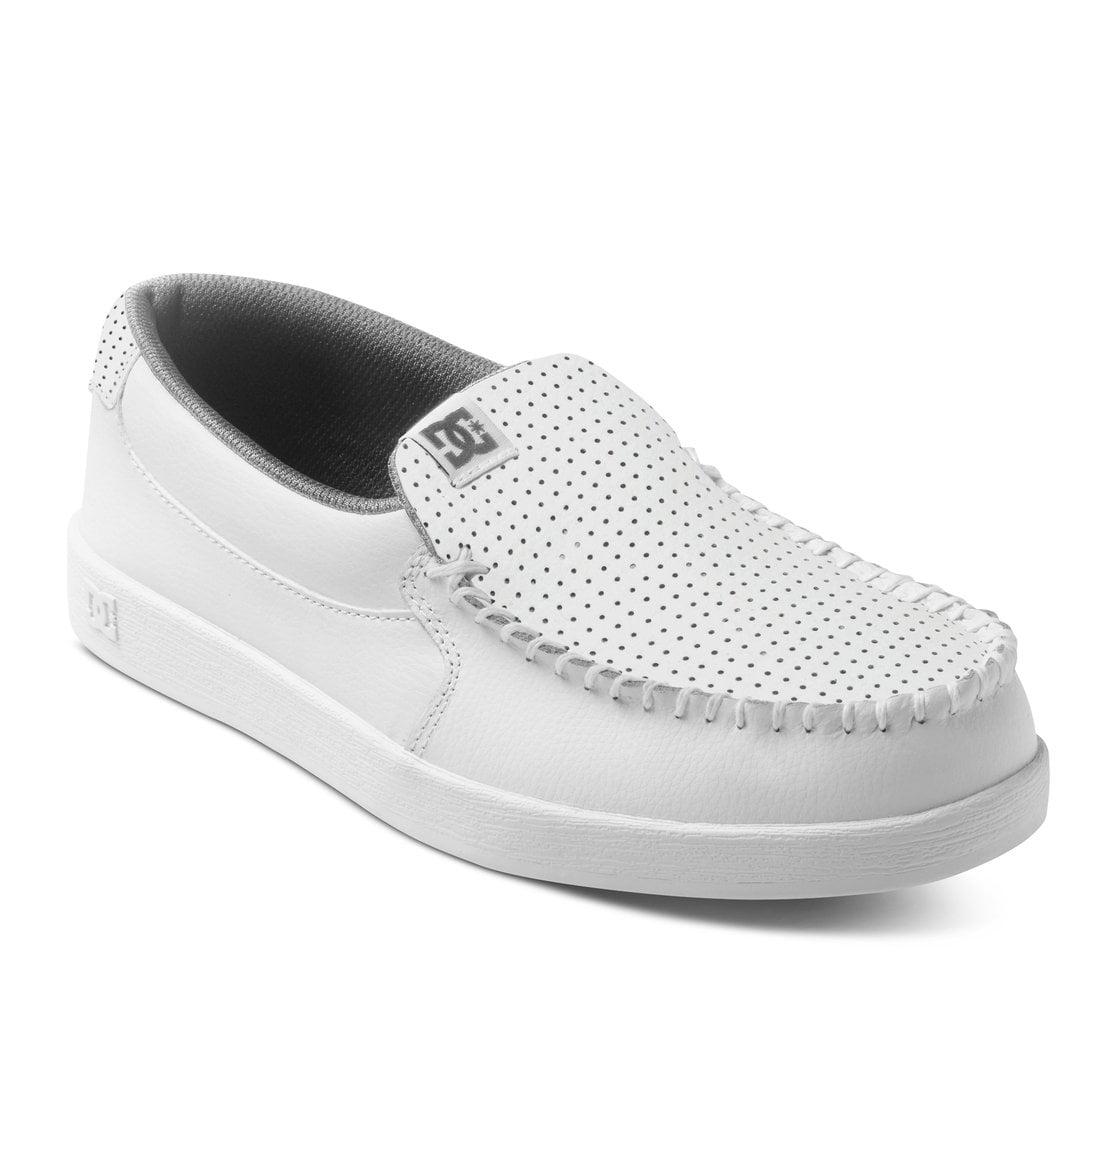 Villain Slip On White Casual Loafers